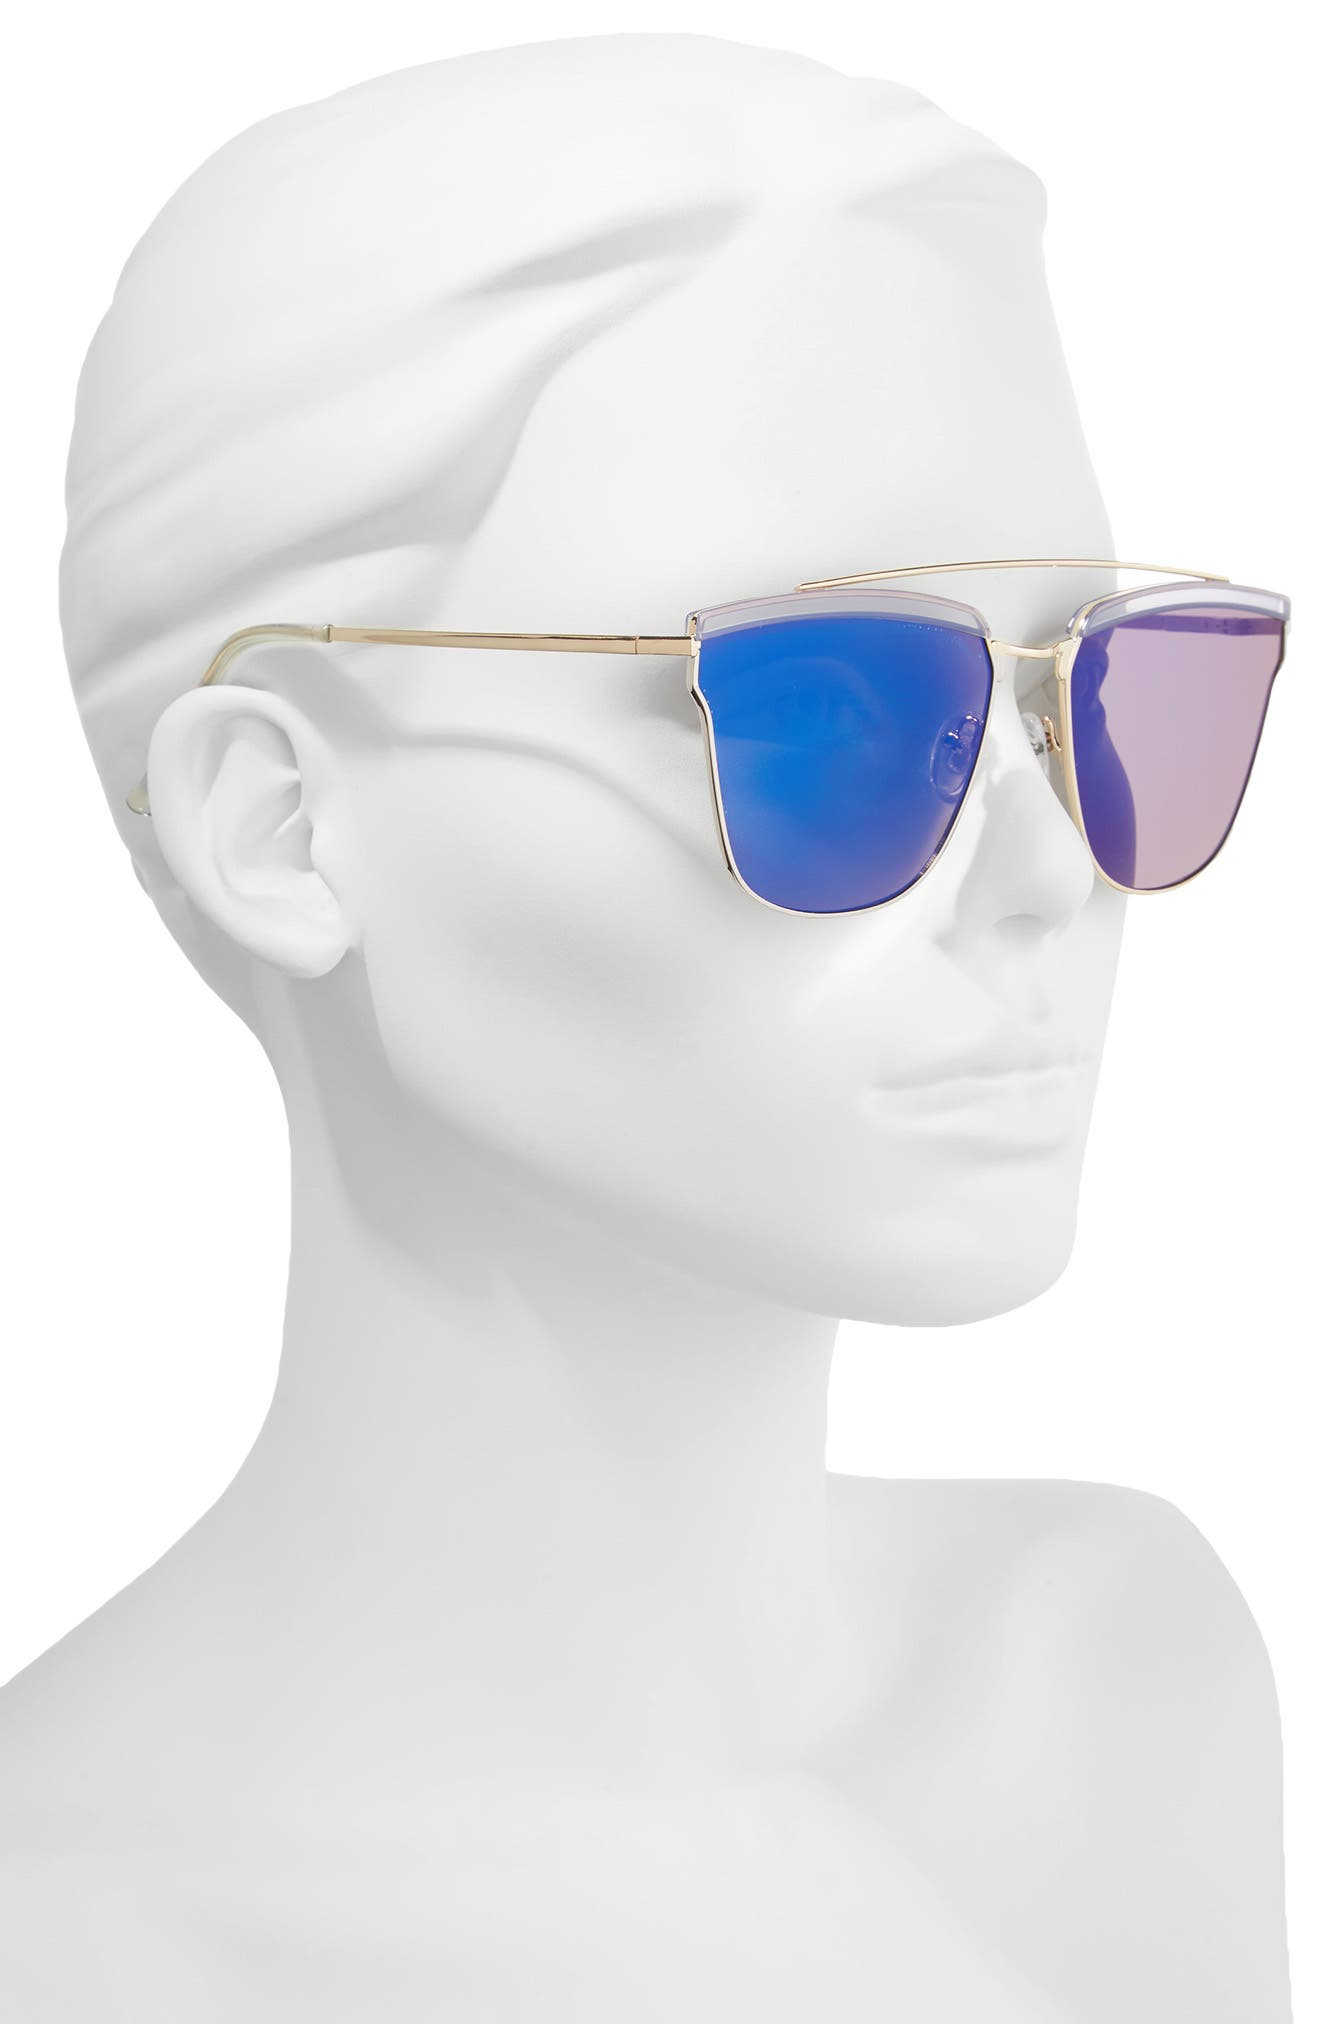 60mm Mirror Sunglasses,                             Alternate thumbnail 2, color,                             712